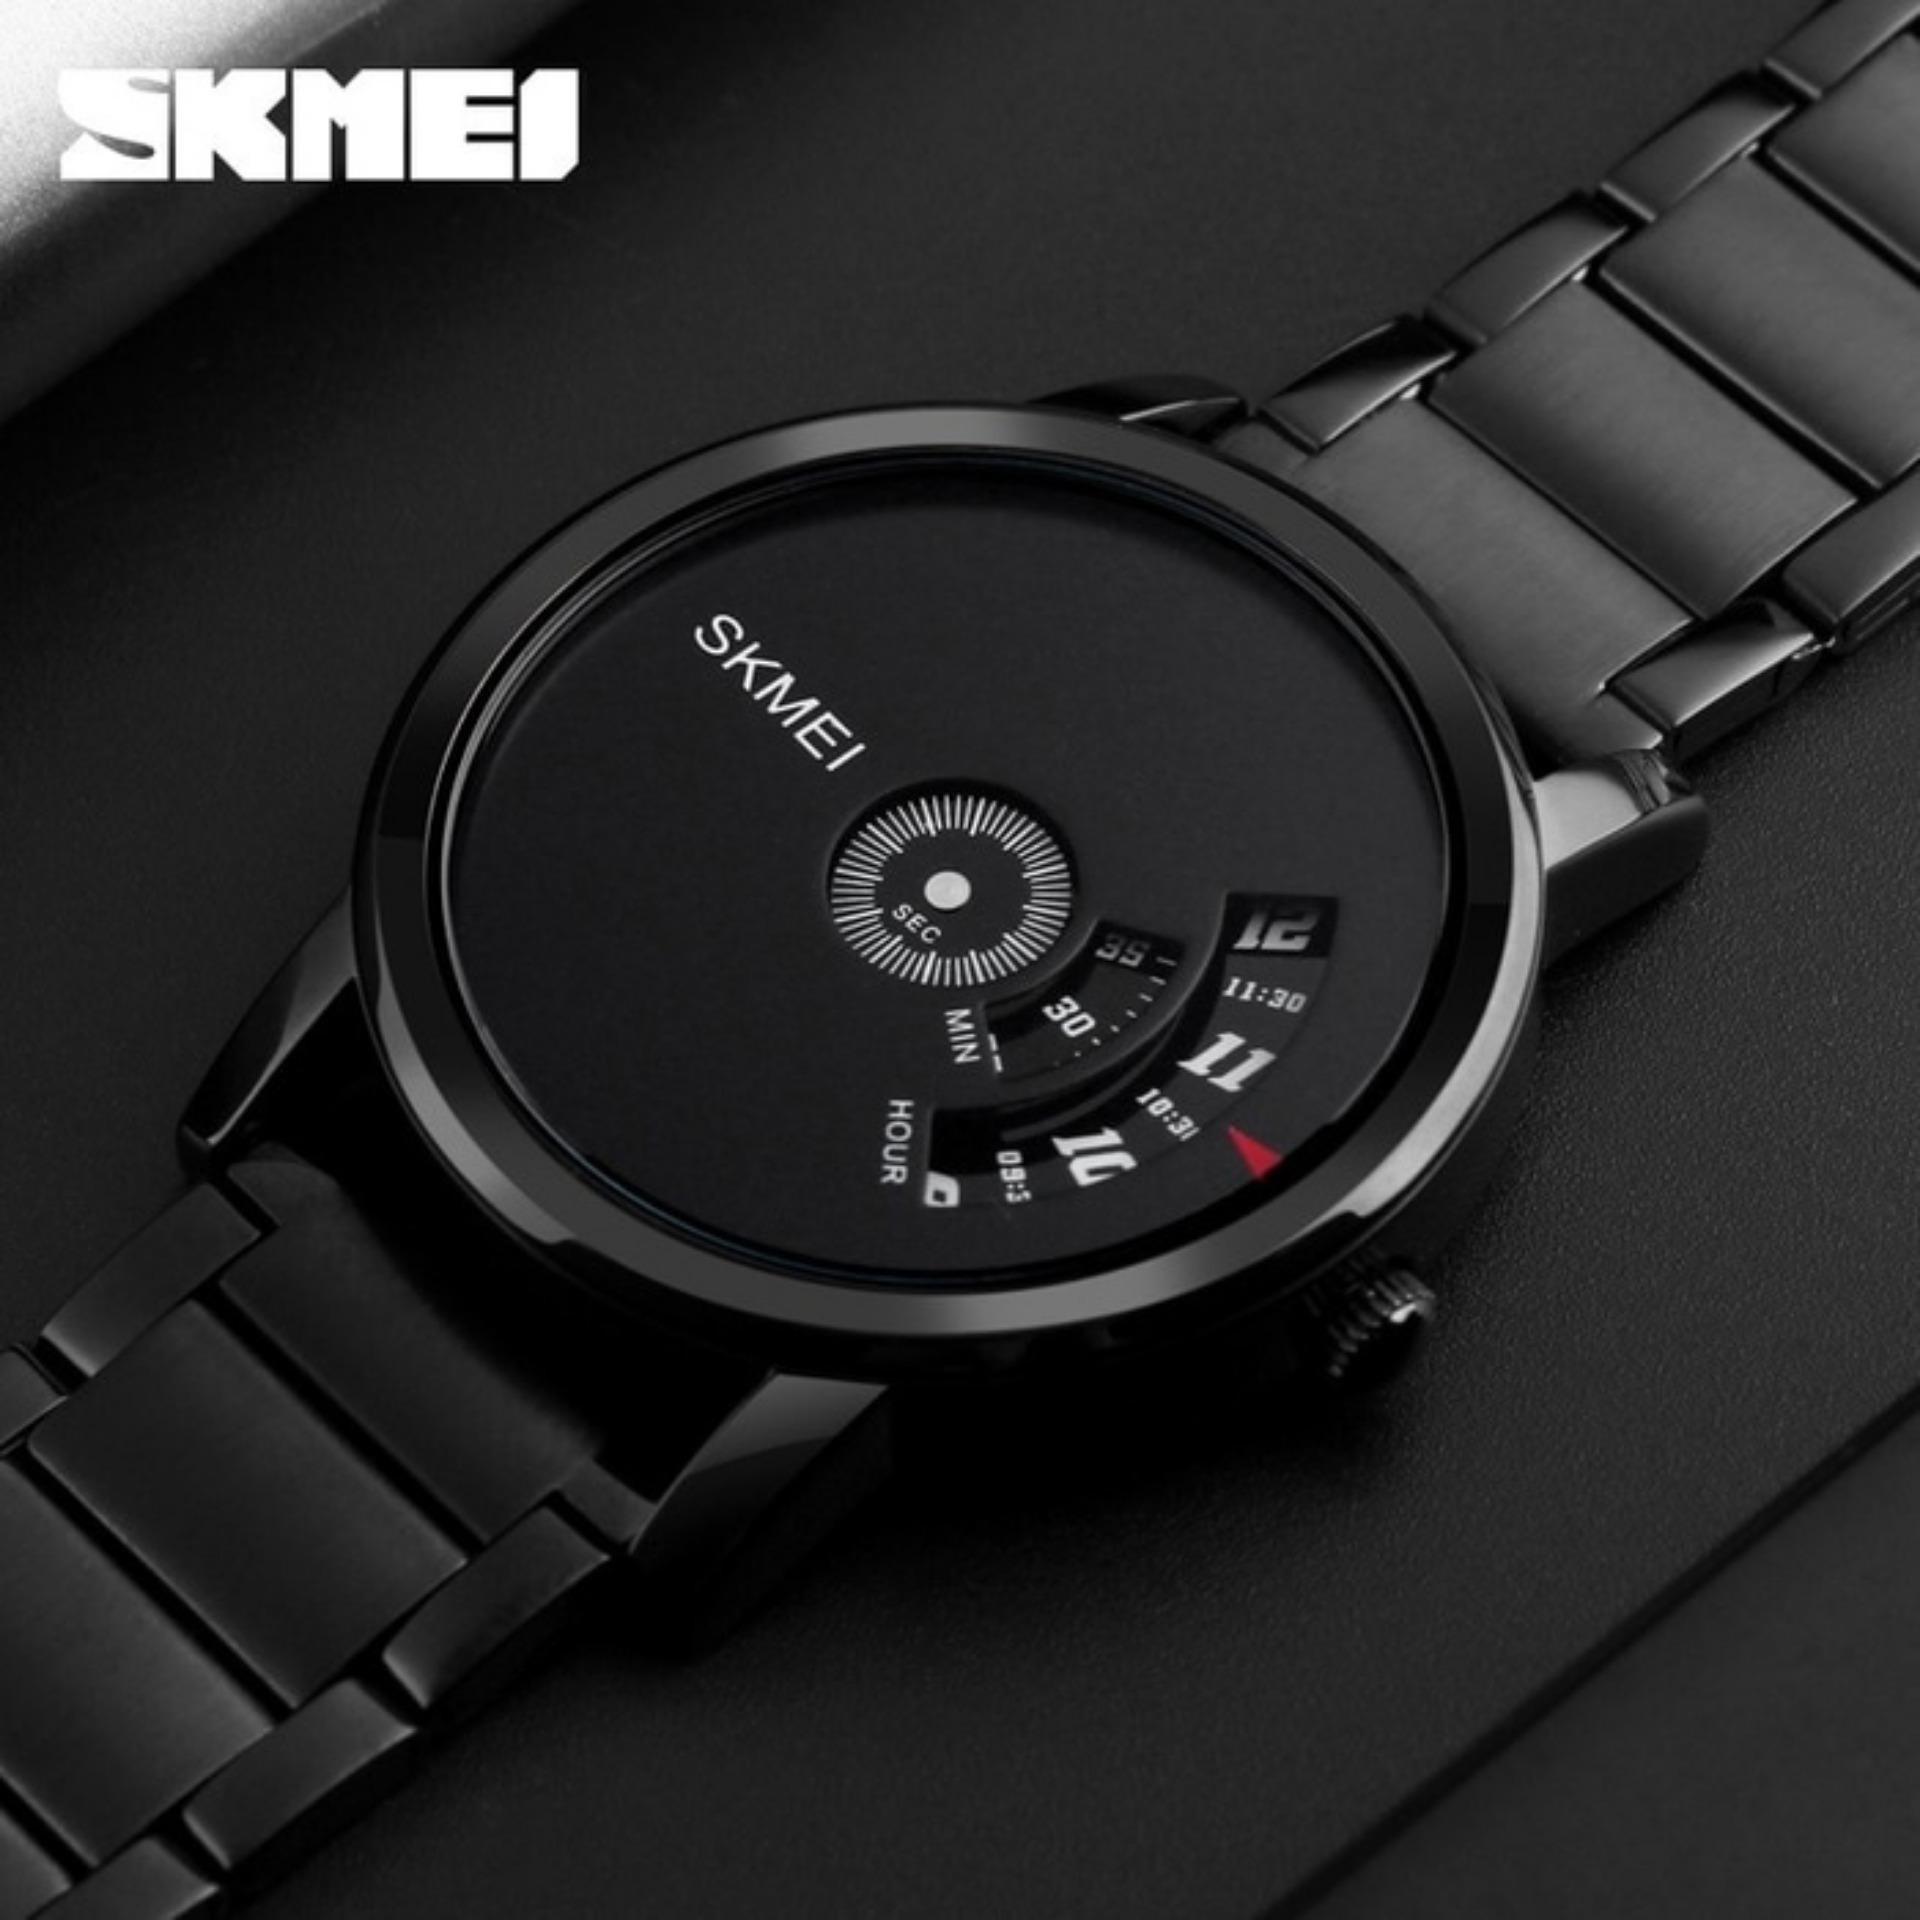 Skmei Cosmo Jam Tangan Pria Hitam Tali Kulit 9083 Black Edition Wanita Biru 1081 Blue 1260 Quartz Sportwatch